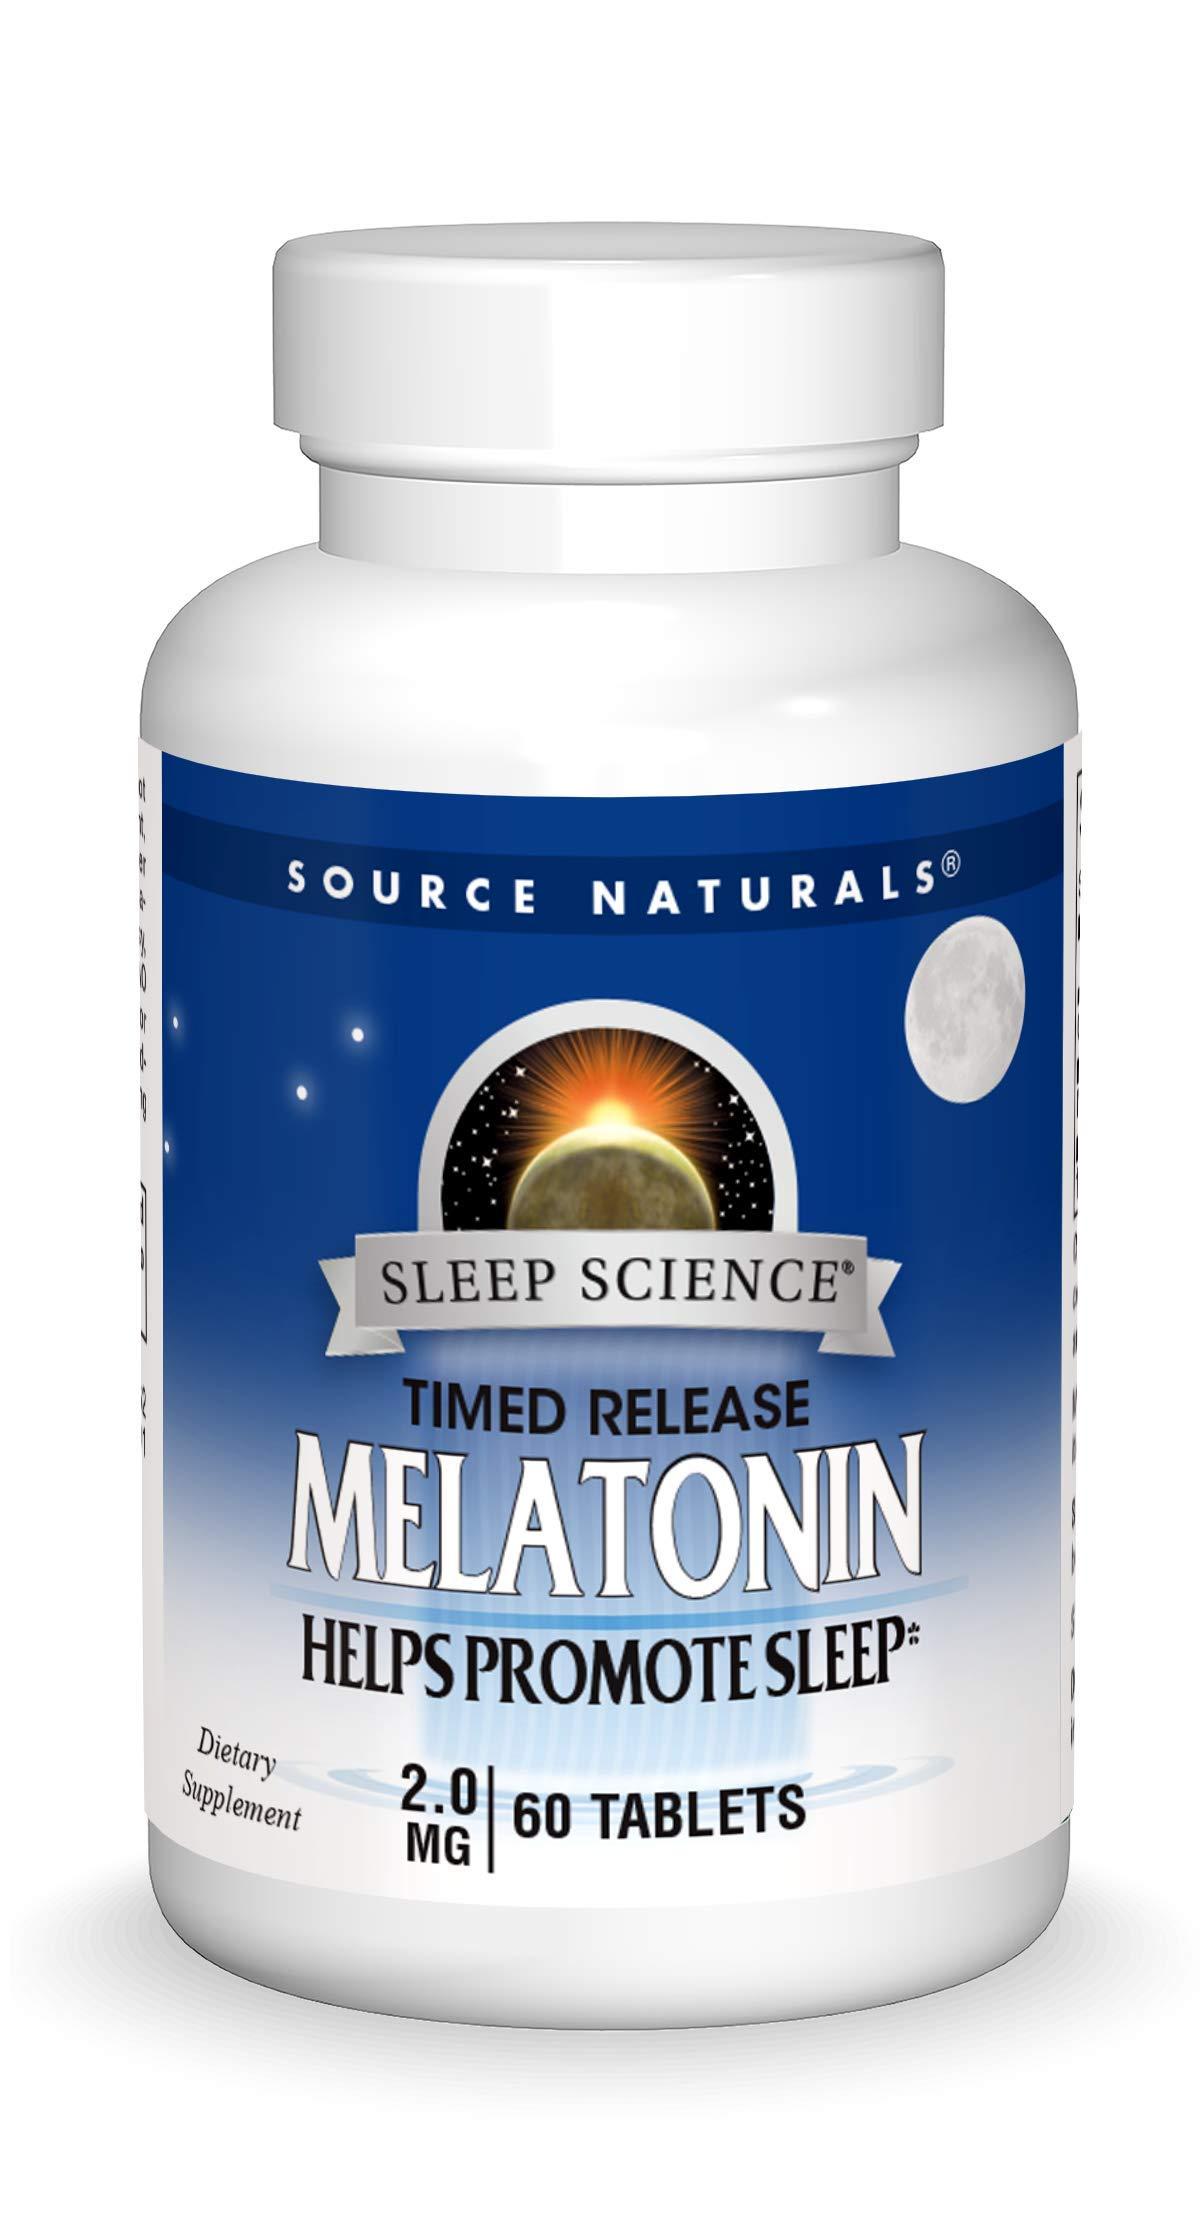 Source Naturals Sleep Science Melatonin 2 mg Helps Promote Sleep - 60 Time Release Tablets